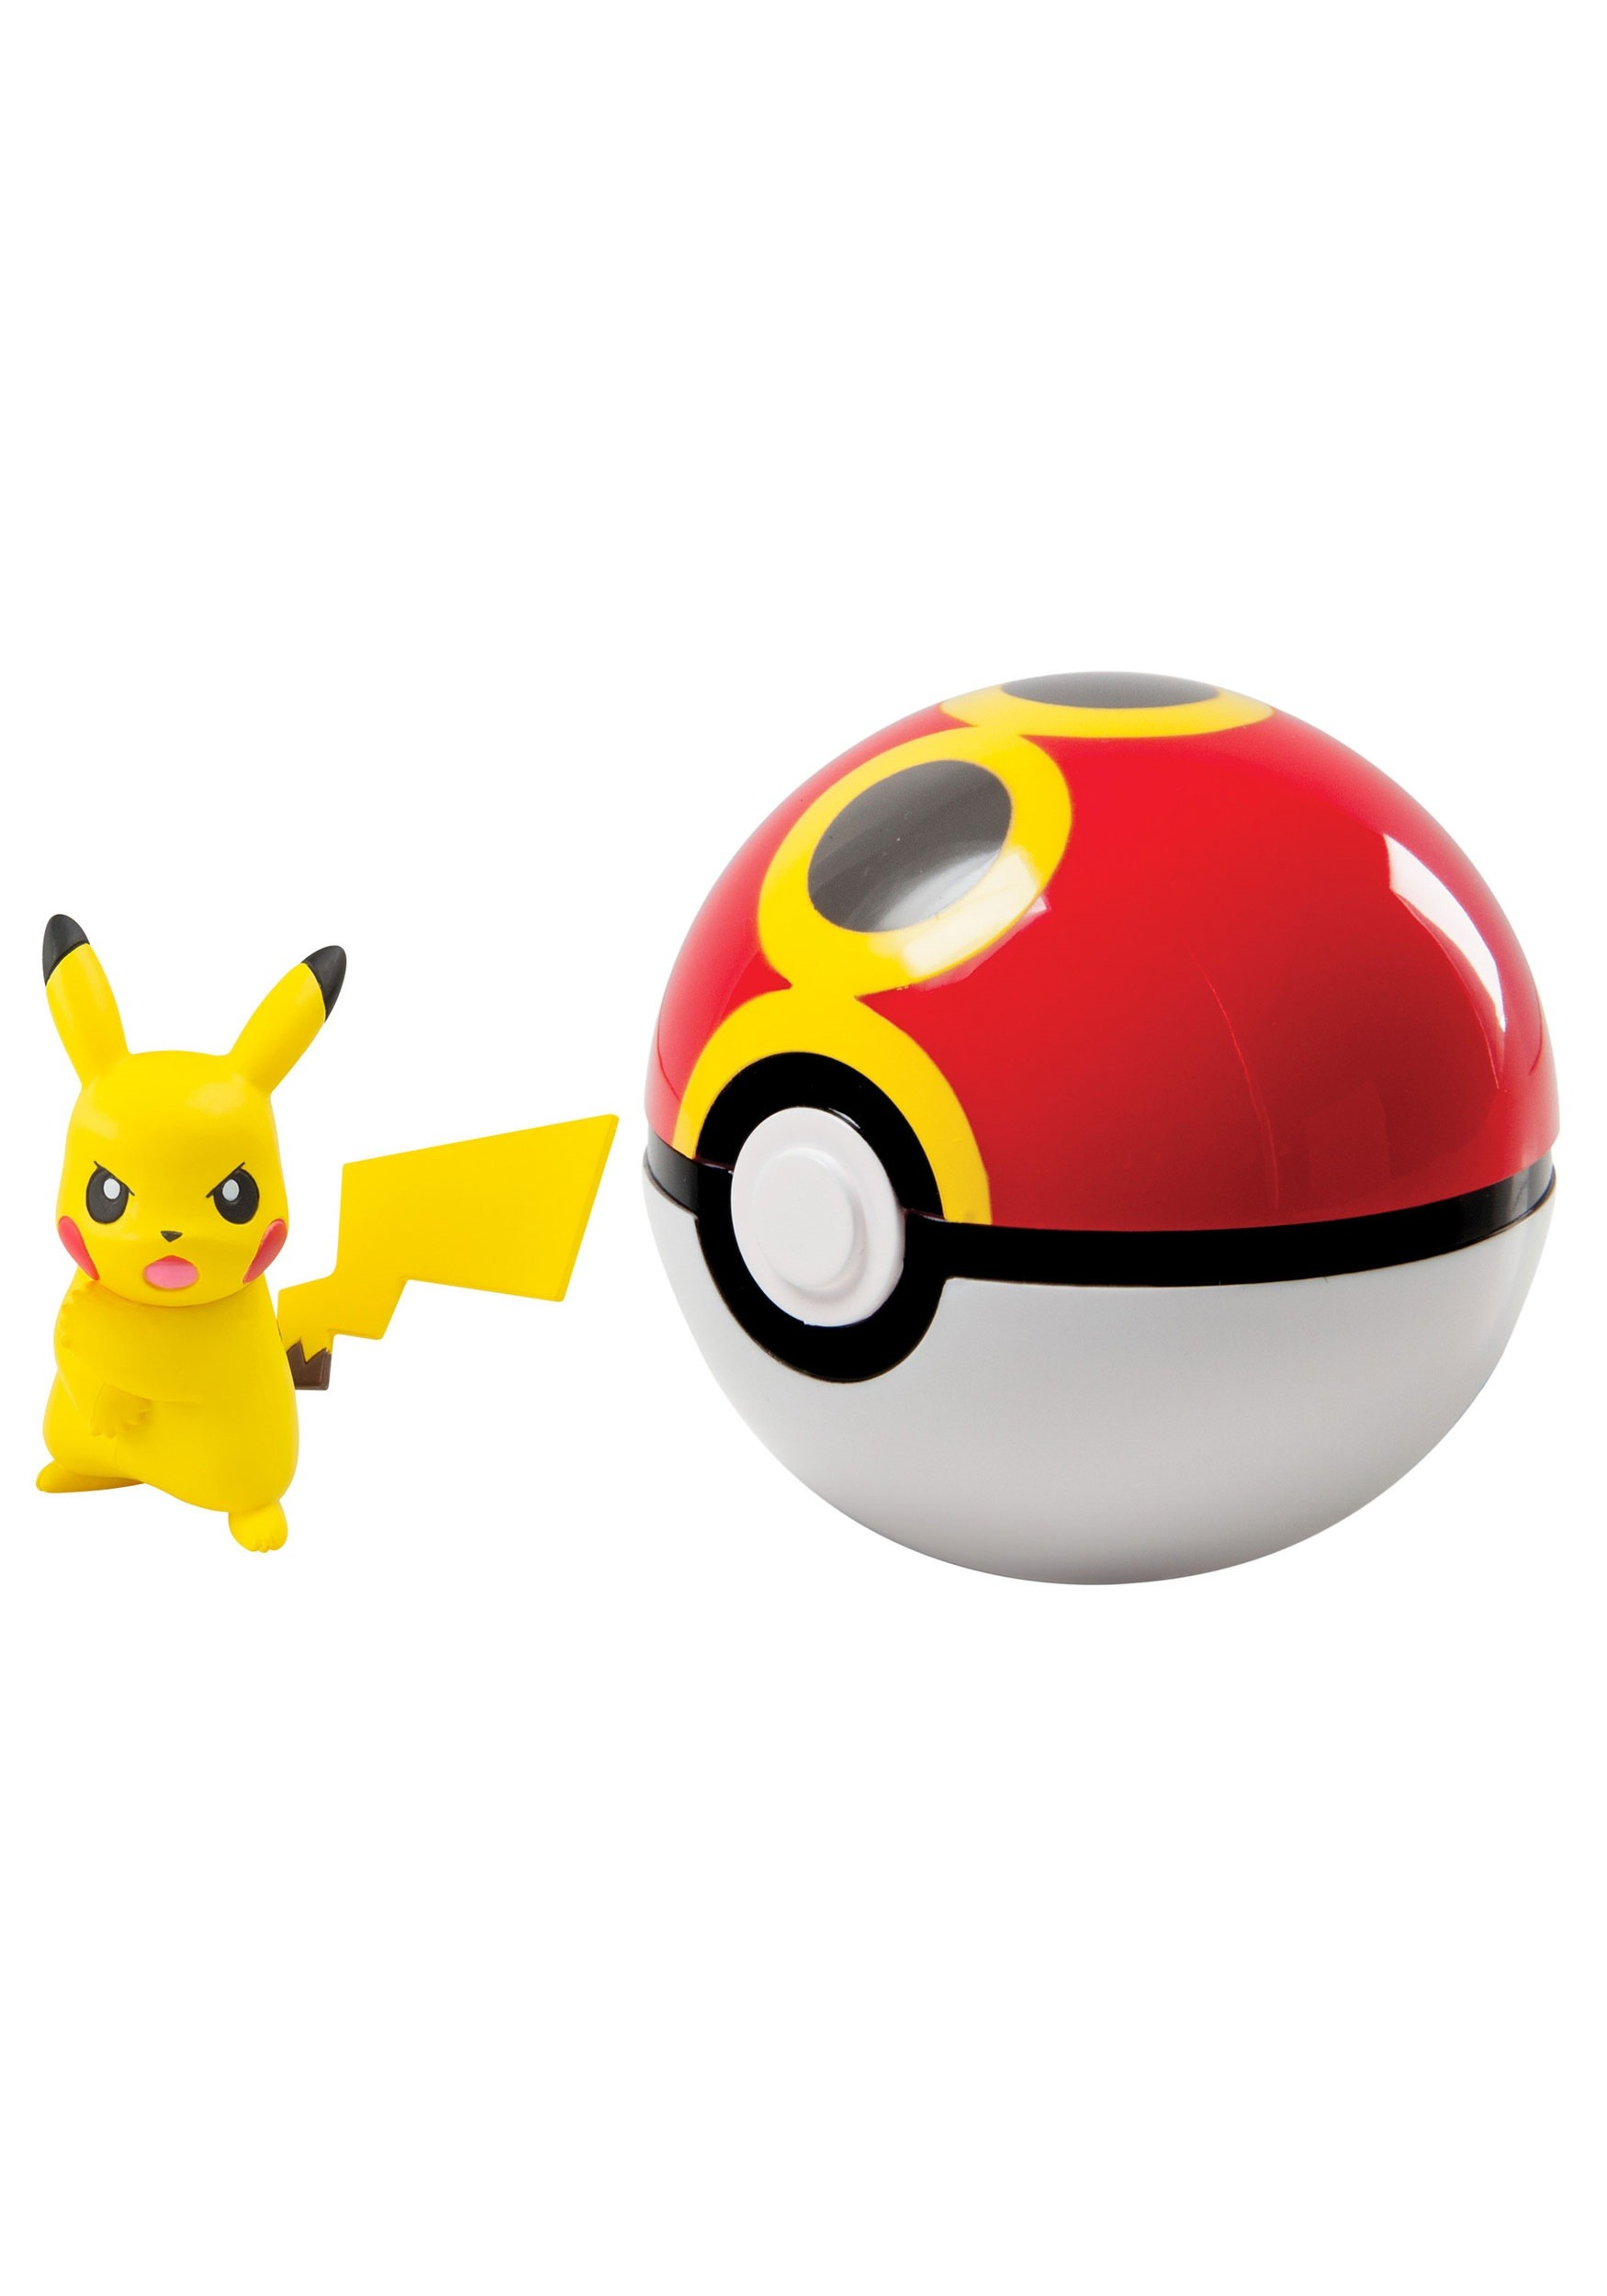 Pikachu + Pokeball Clip n Carry TOMT19119